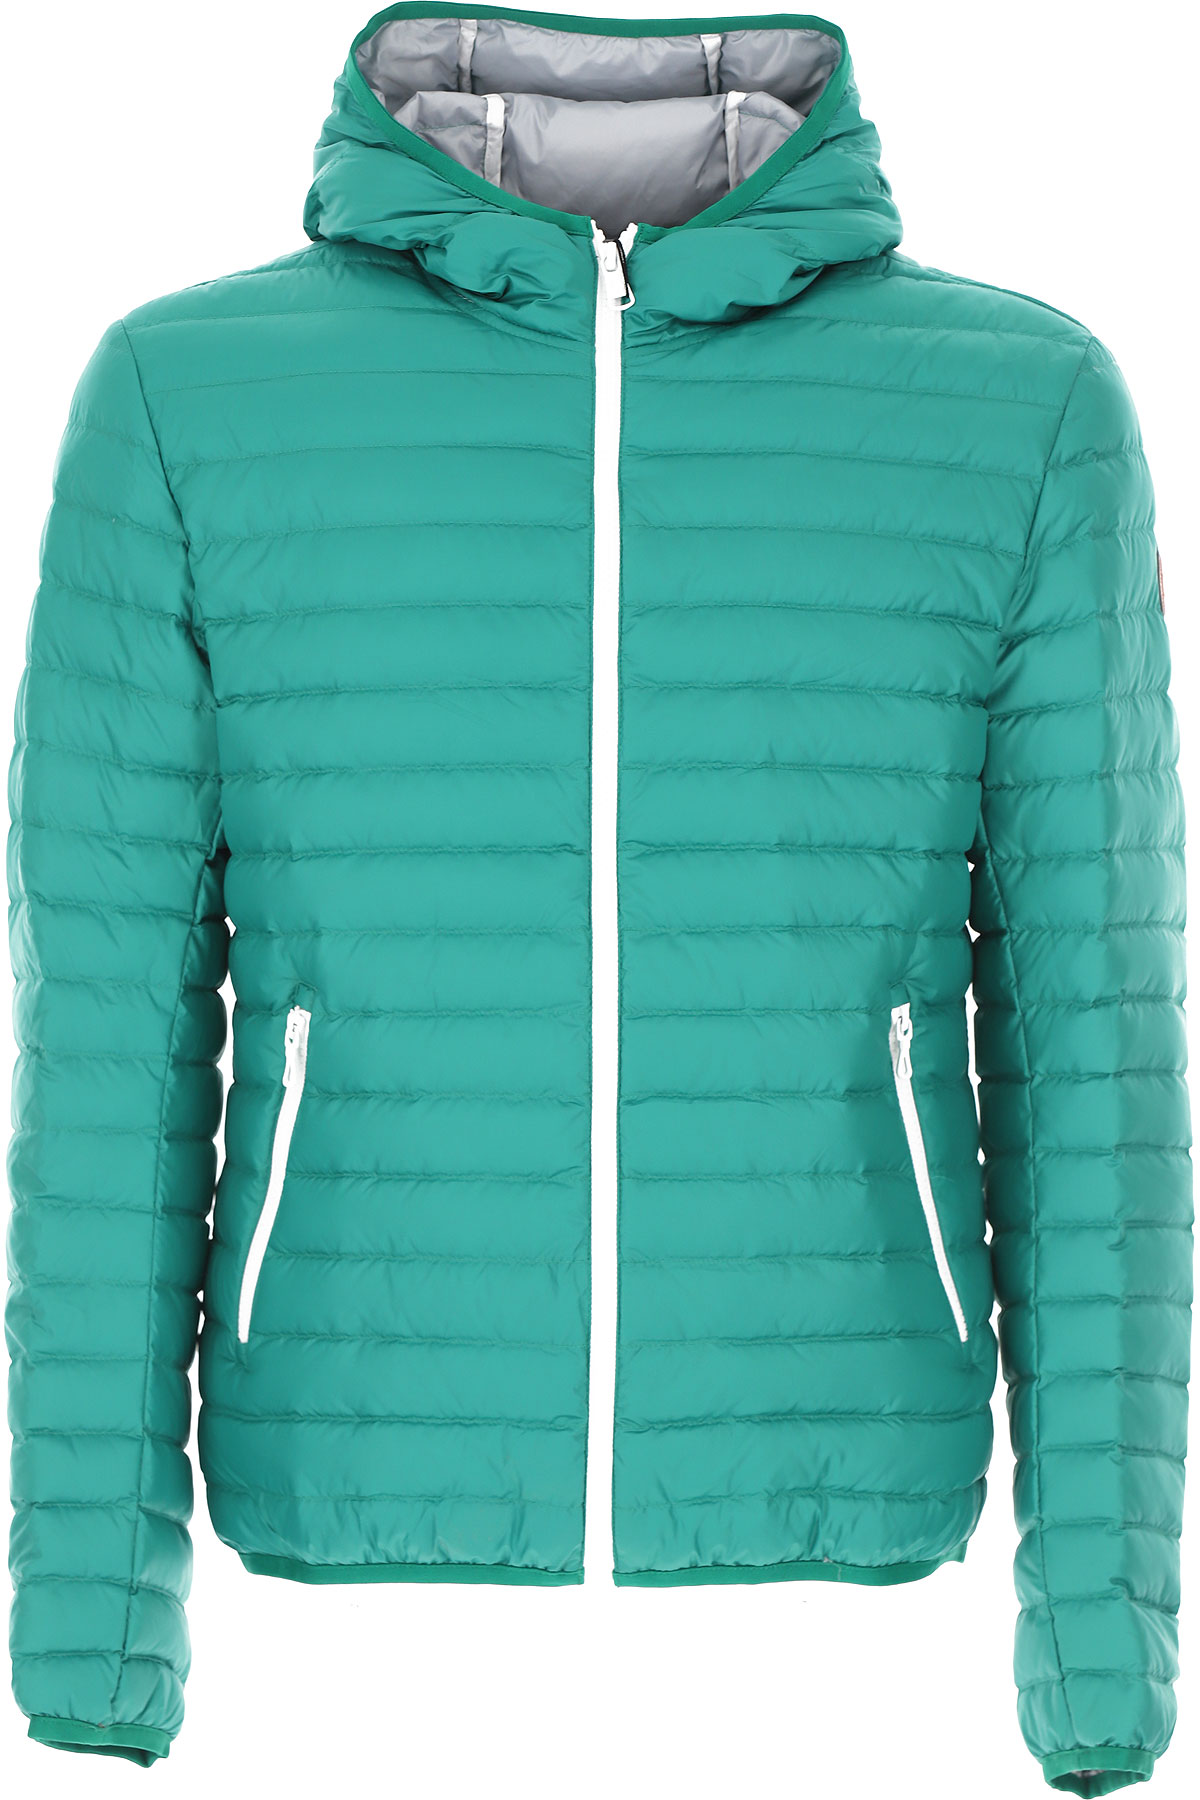 Colmar Down Jacket for Men, Puffer Ski Jacket On Sale, Medium Green, Down, 2019, L M XL